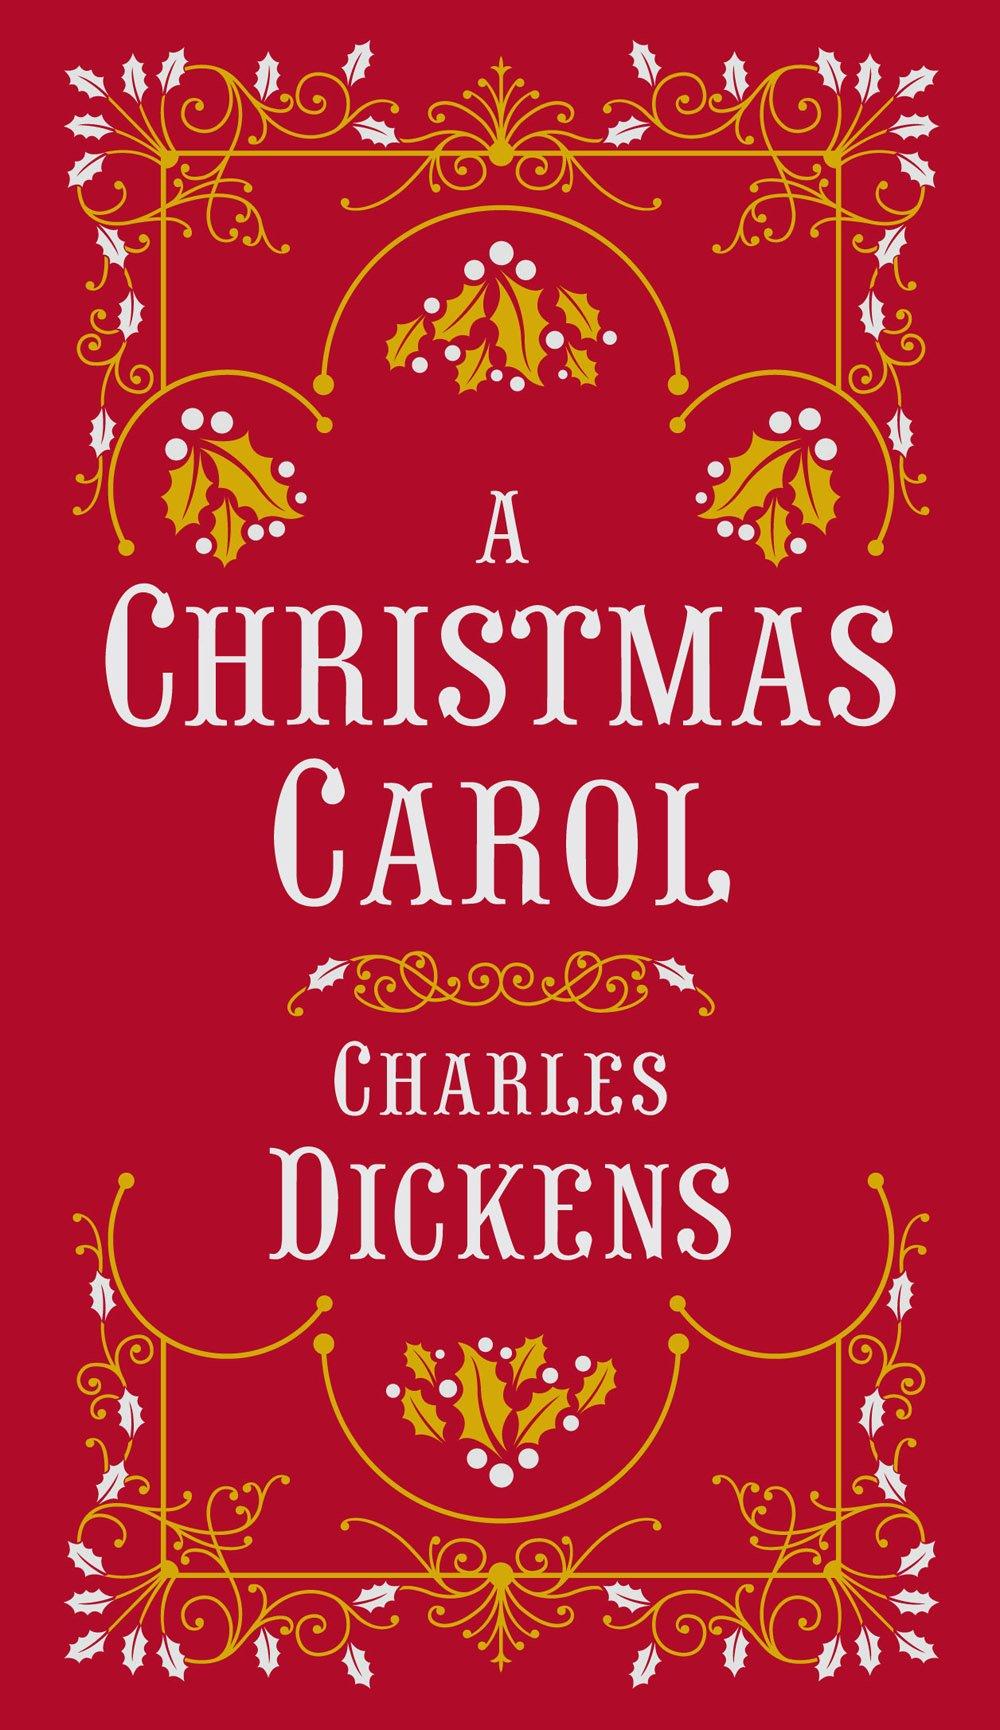 Amazon.com: A Christmas Carol (Barnes & Noble Collectible Editions ...